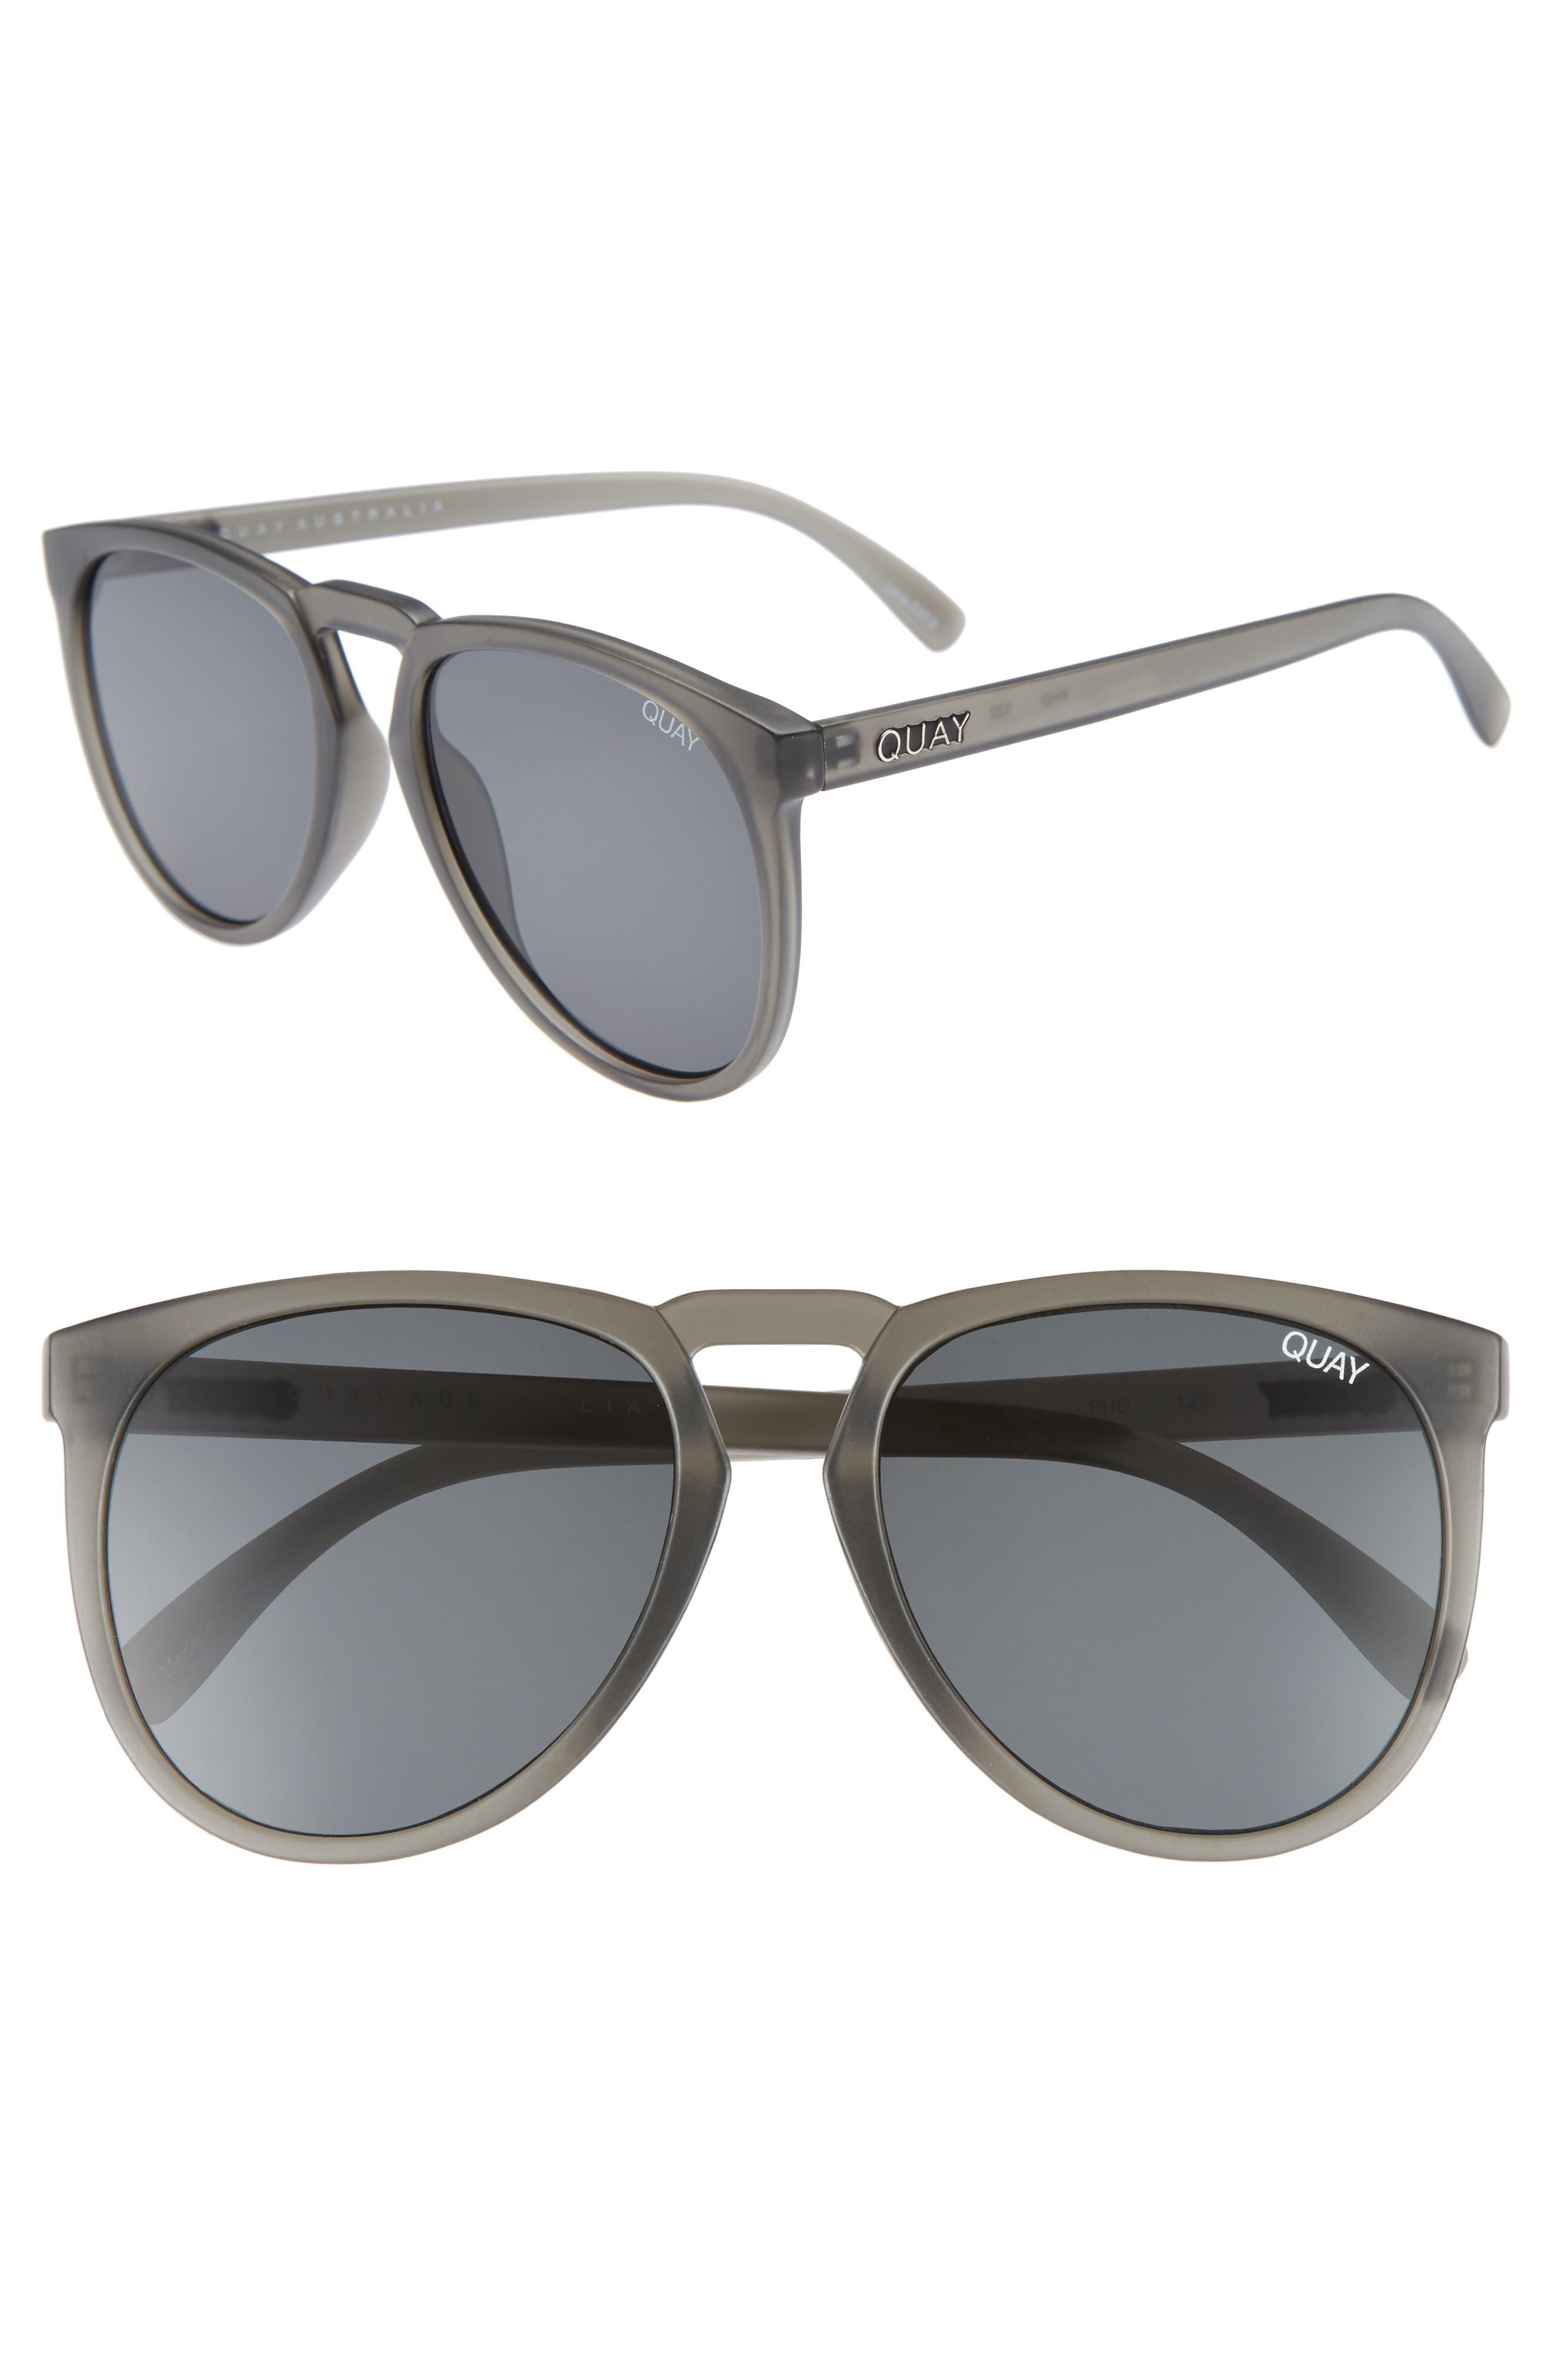 PhD 65mm Sunglasses,                         Main,                         color, GREY/SMOKE